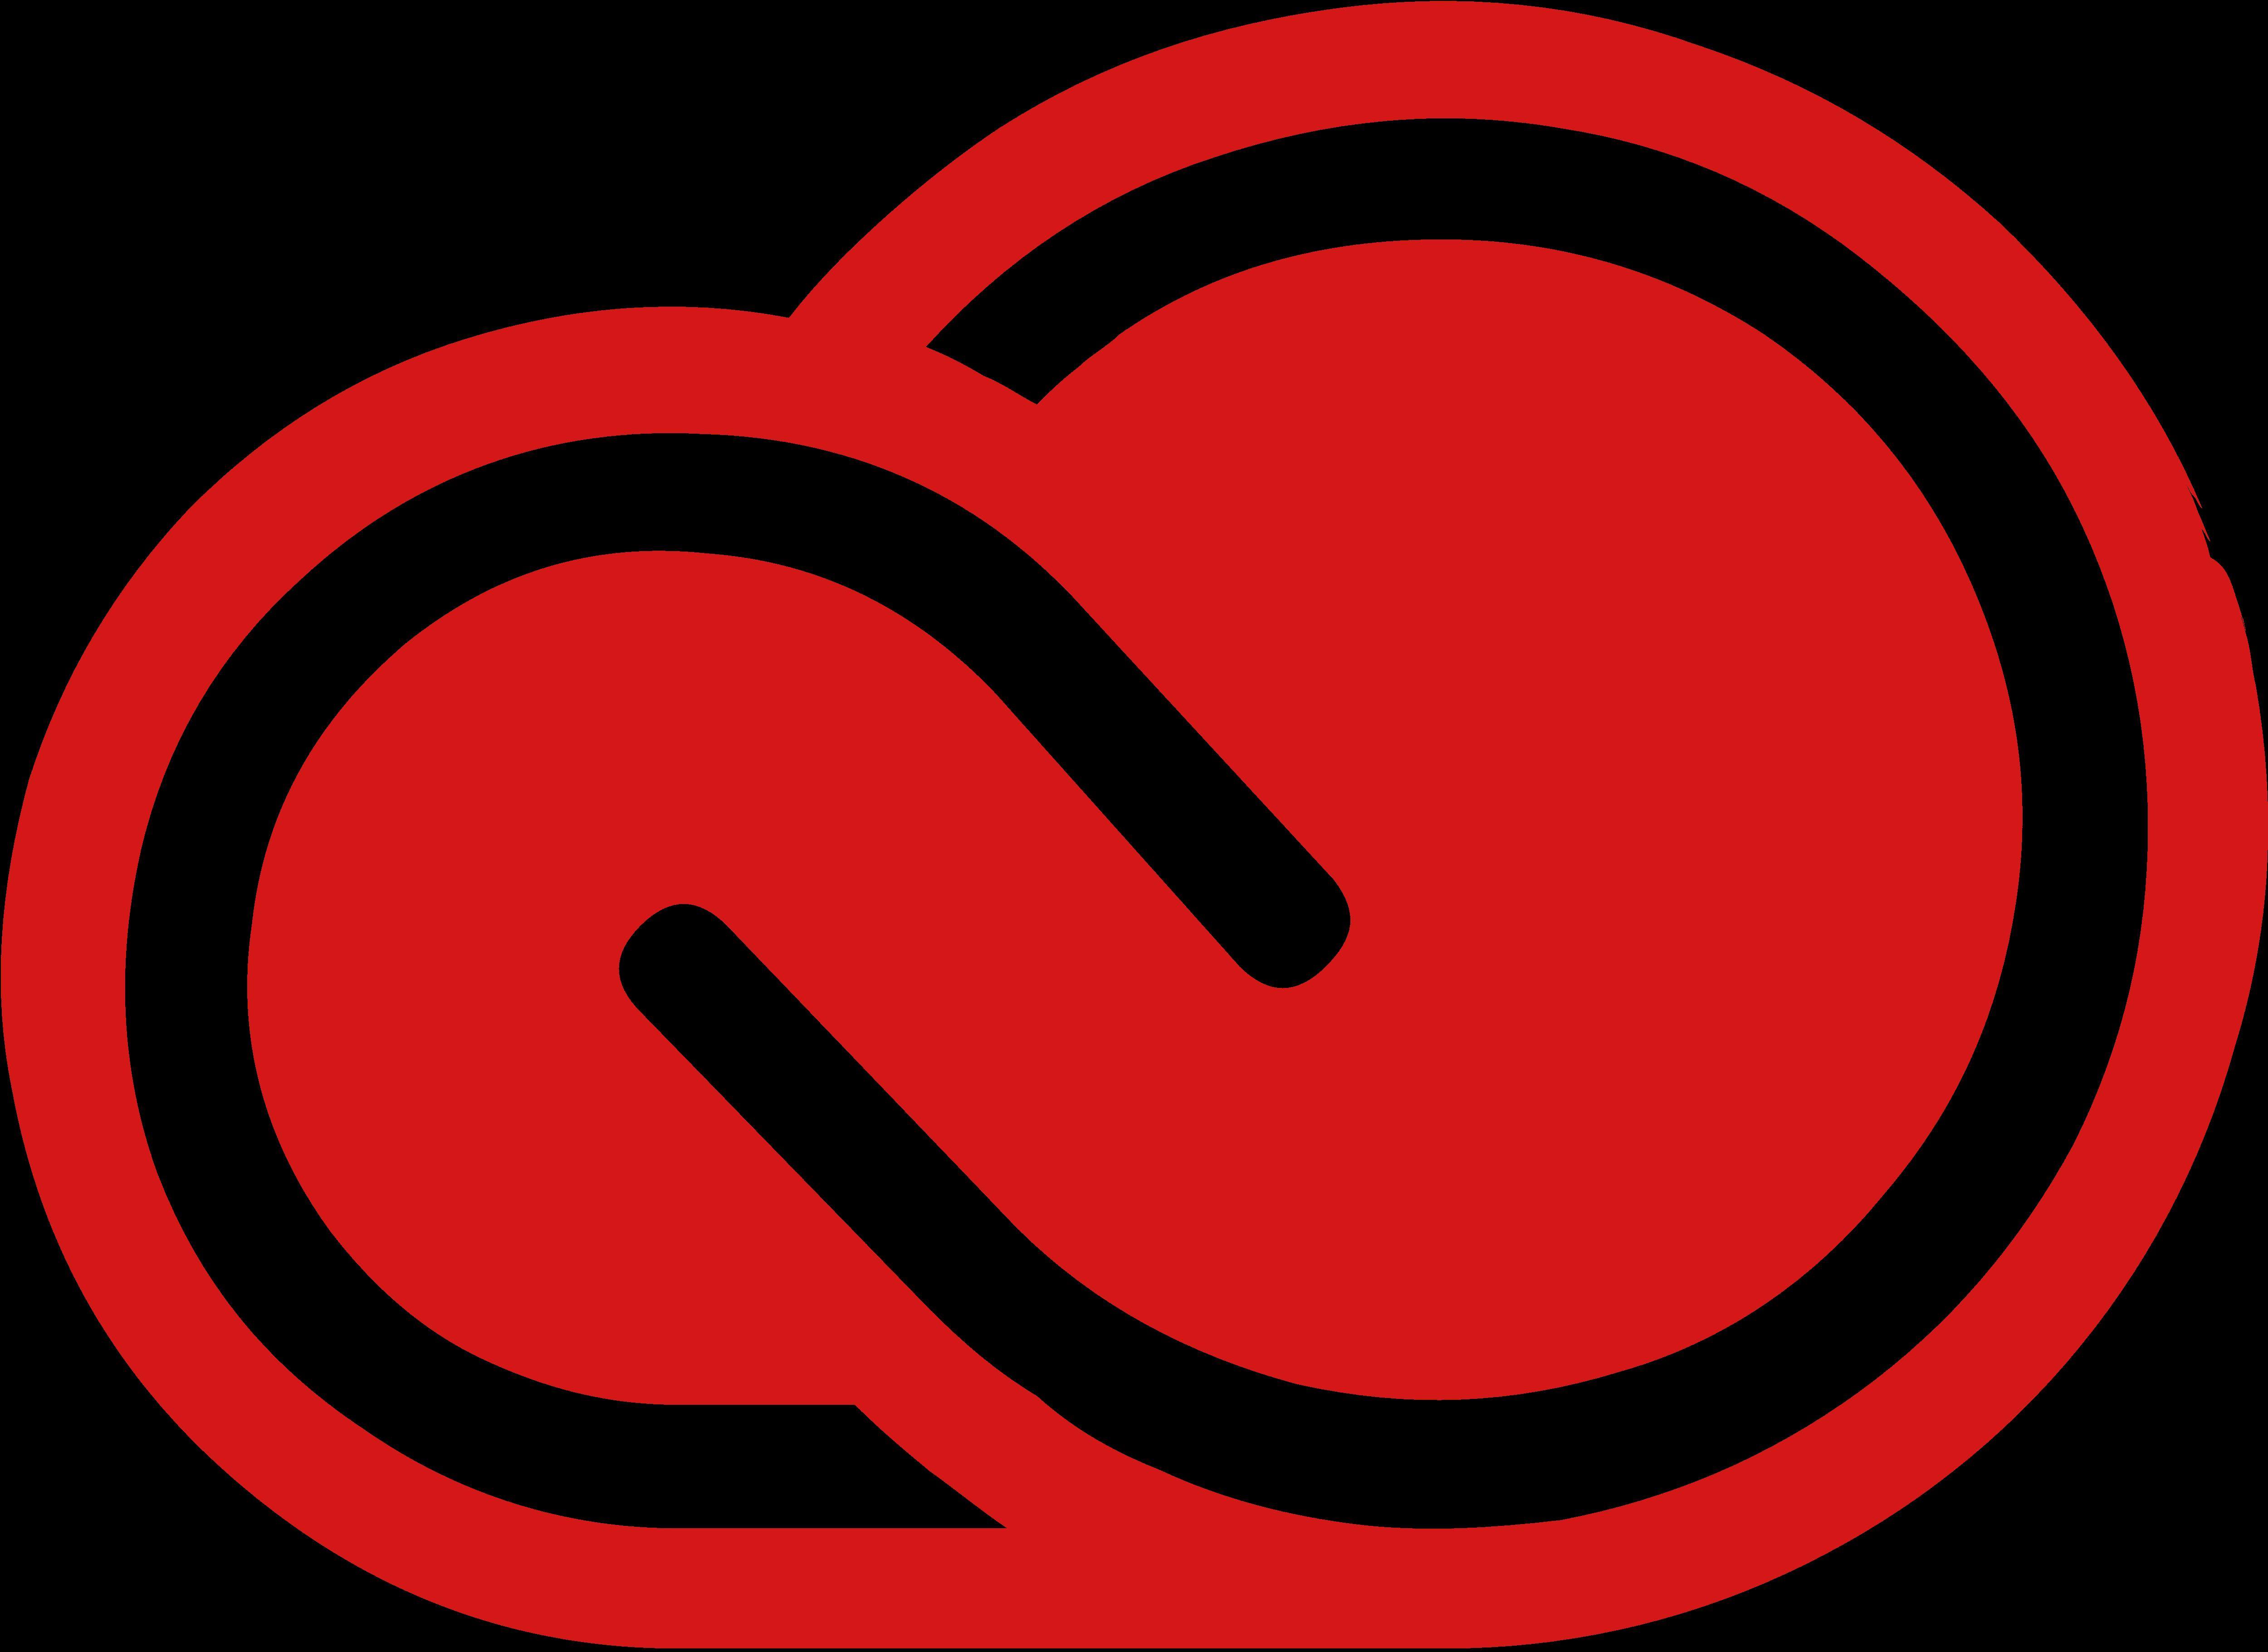 Adobe Creative Cloud – Logos Download - Adobe Creative Cloud Logo PNG